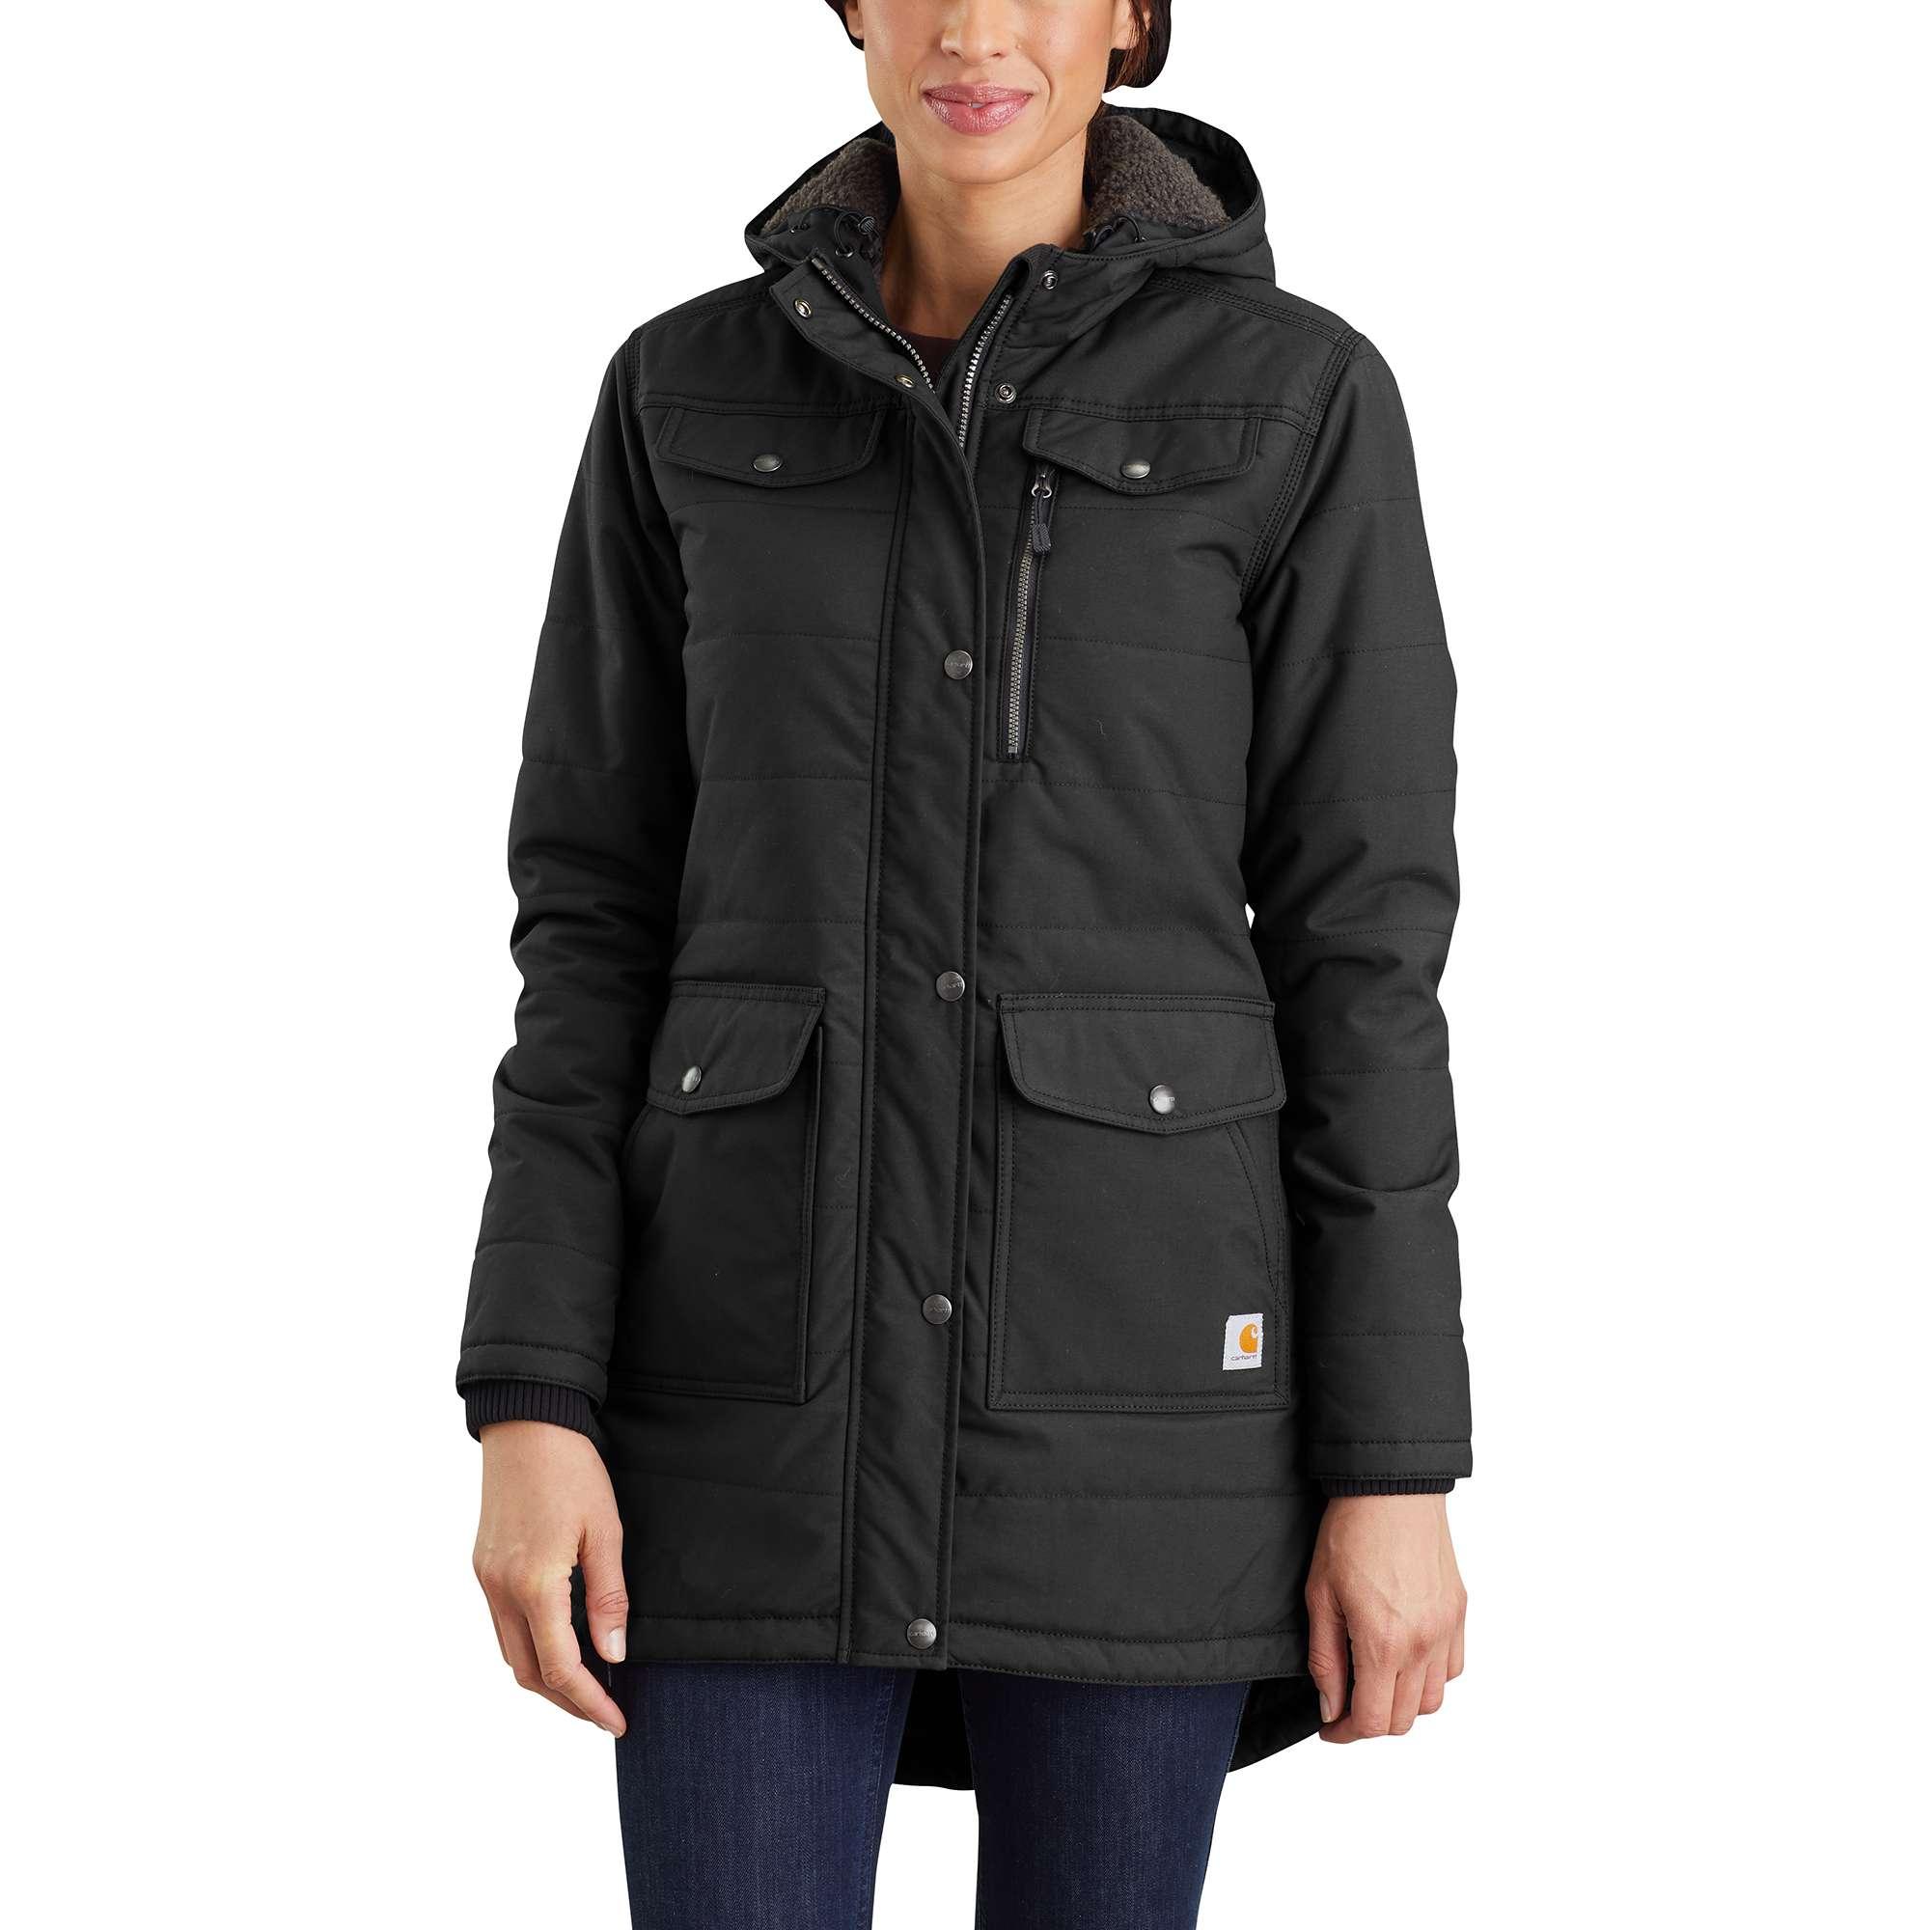 Carhartt Women's Utility Coat Size: LG